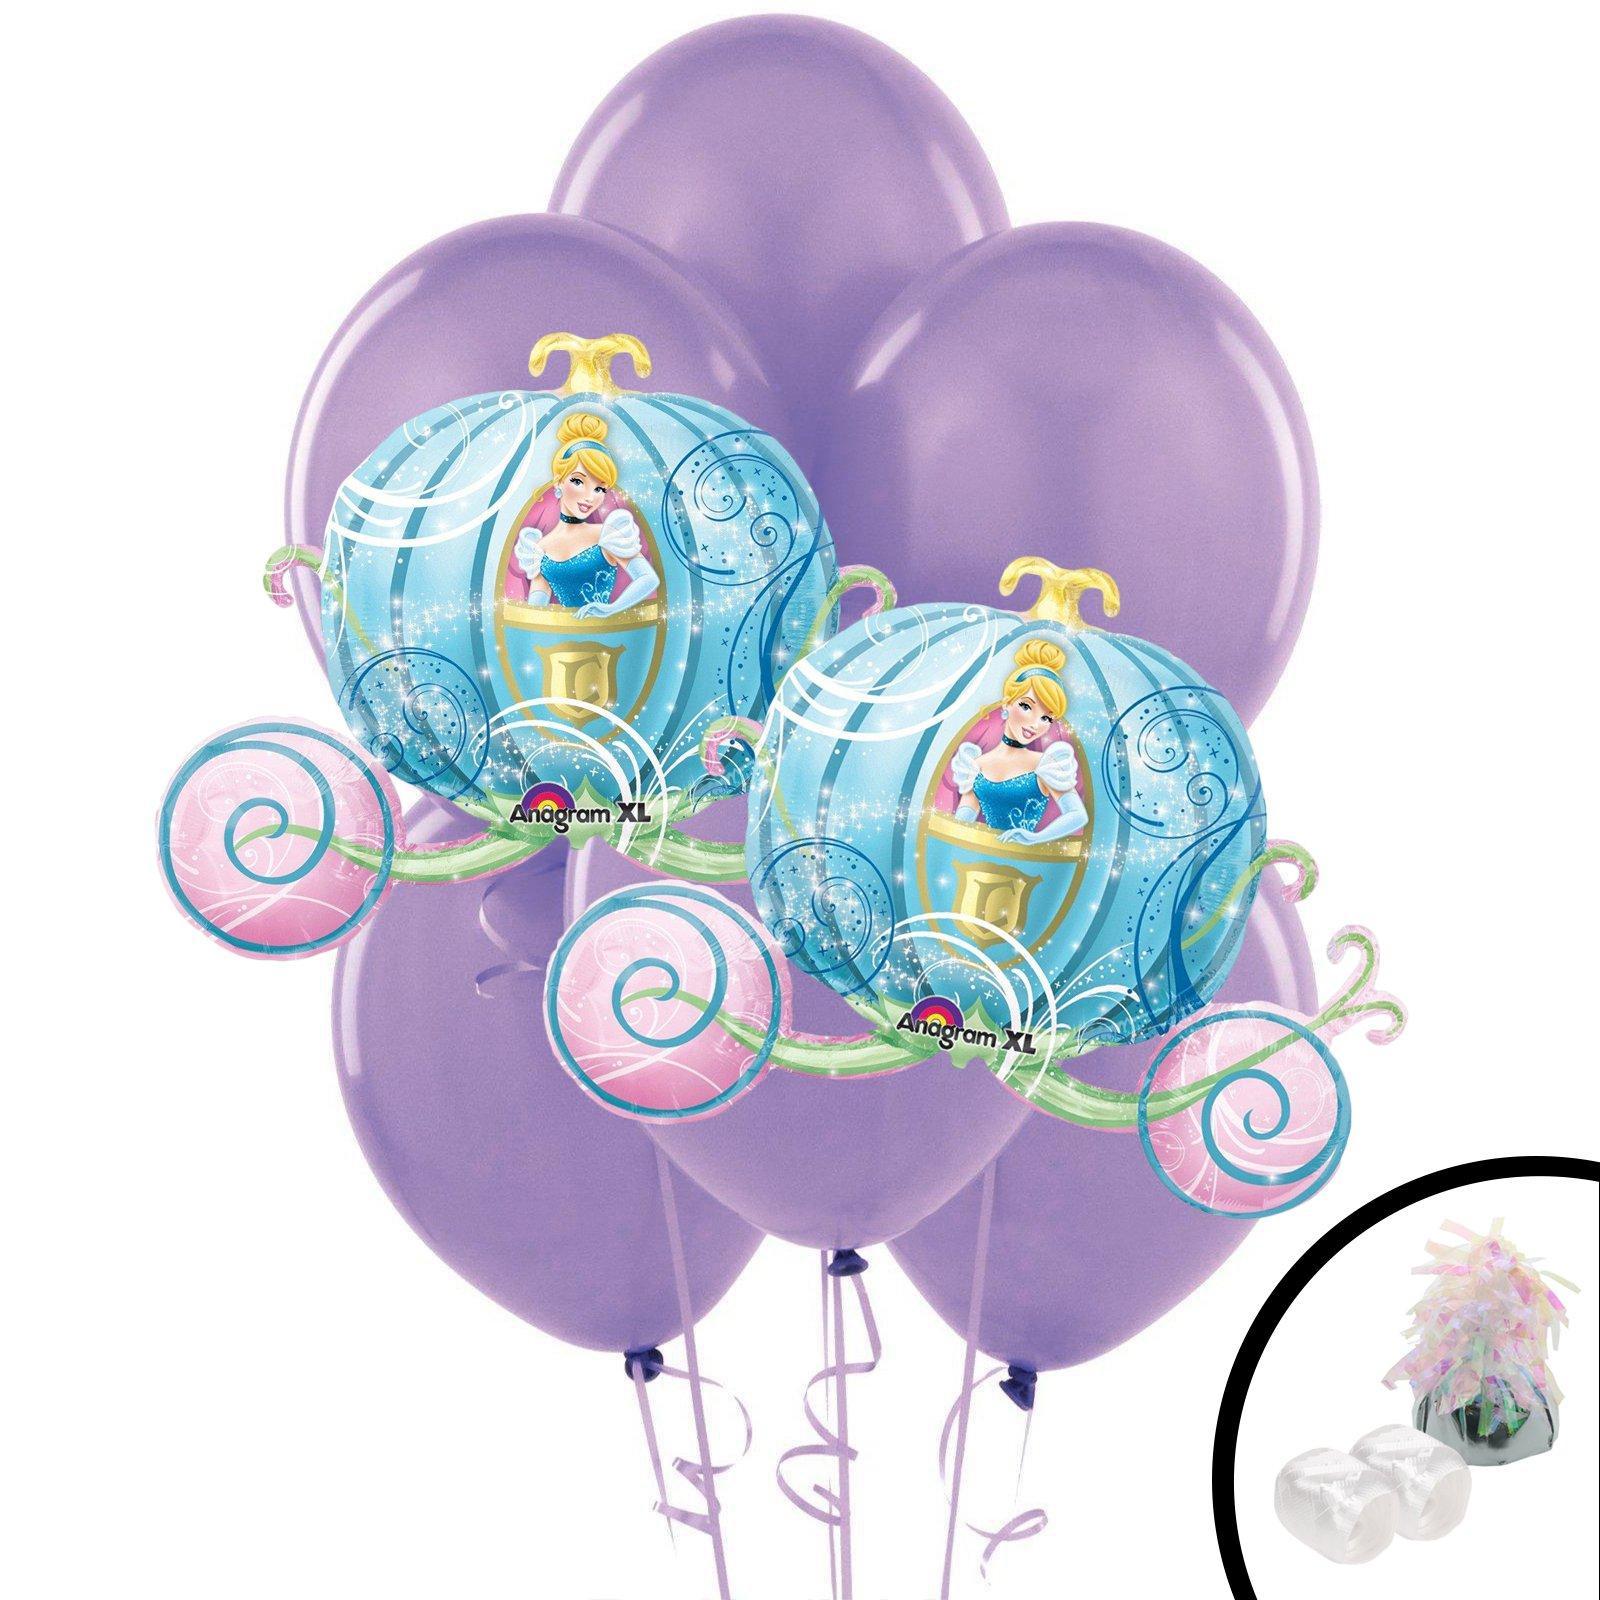 Cinderella Princess Carriage Jumbo Balloon Bouquet